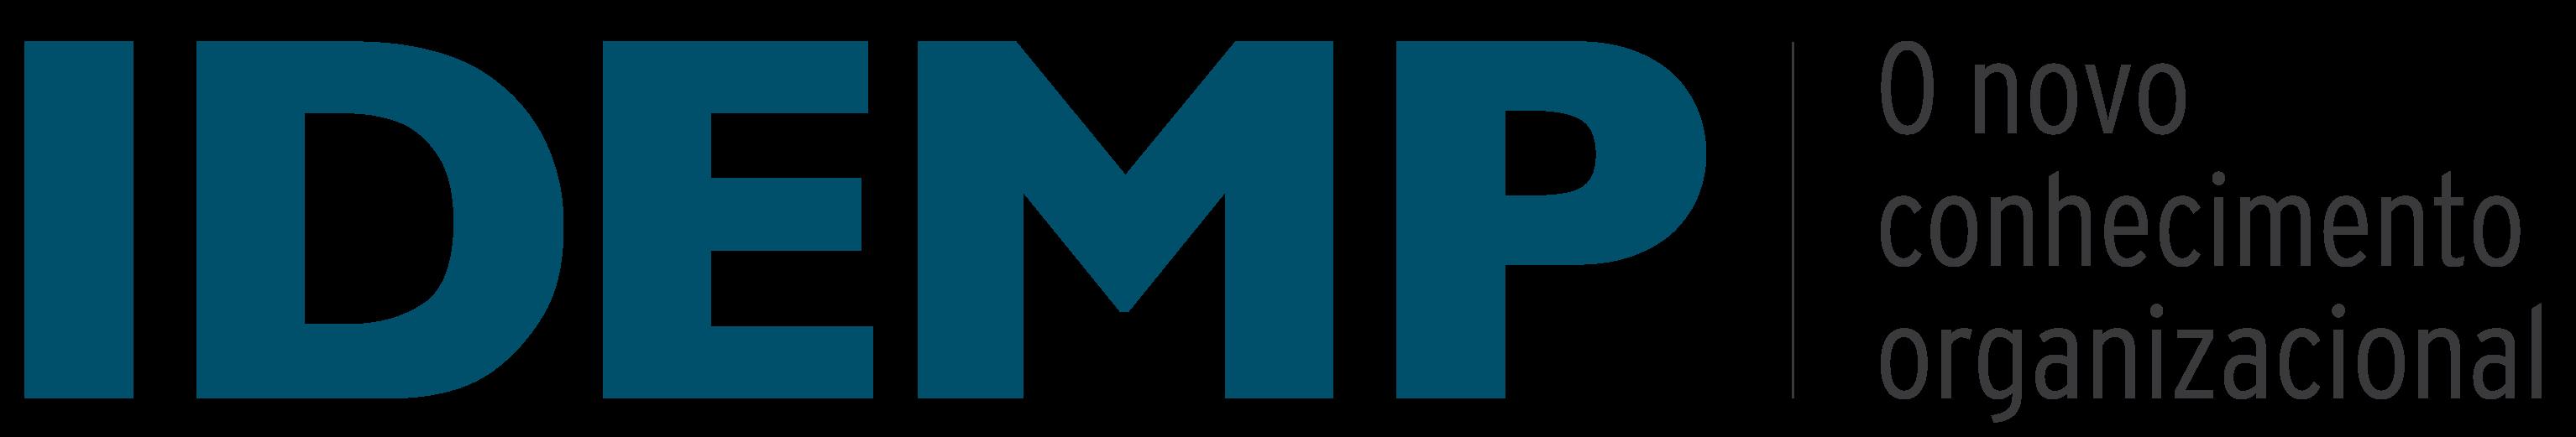 Webinar IDEMP – Treinamento Empresarial